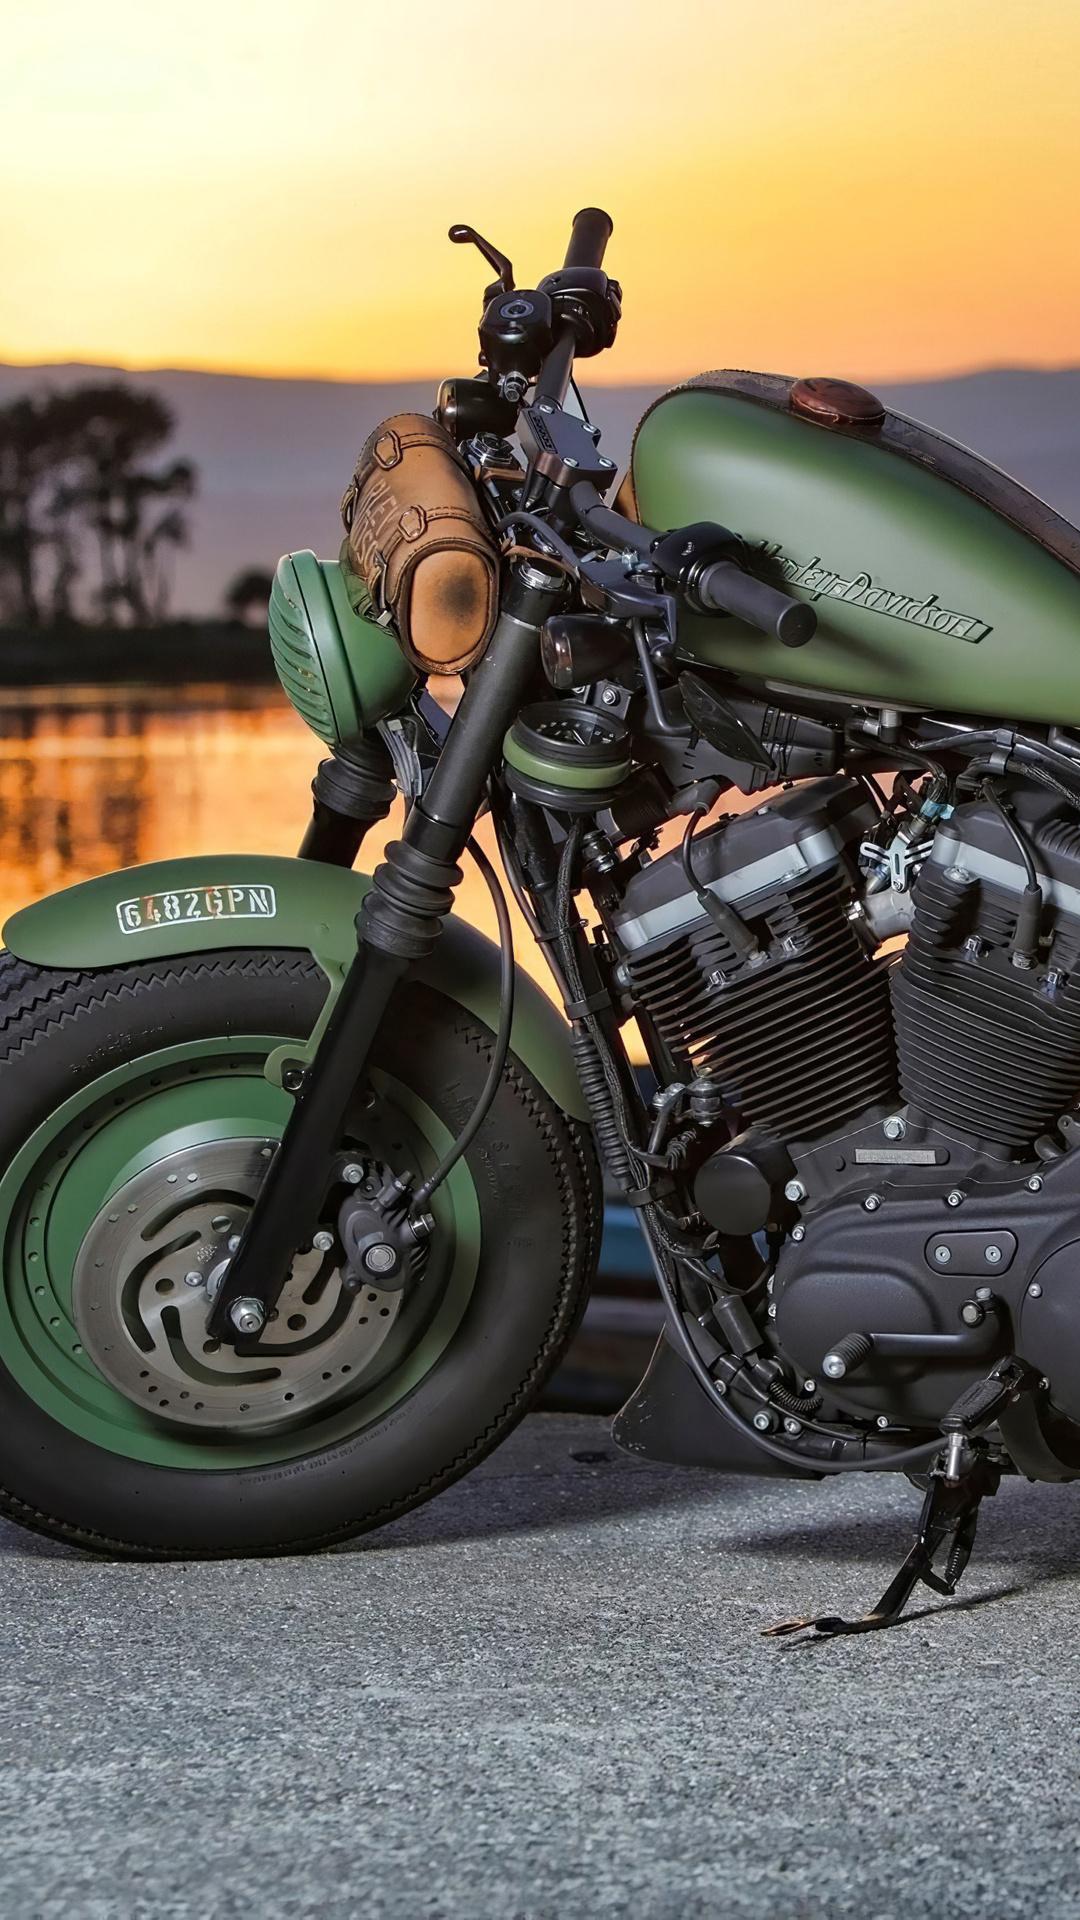 heavy bike Harley Davidson Wallpaper